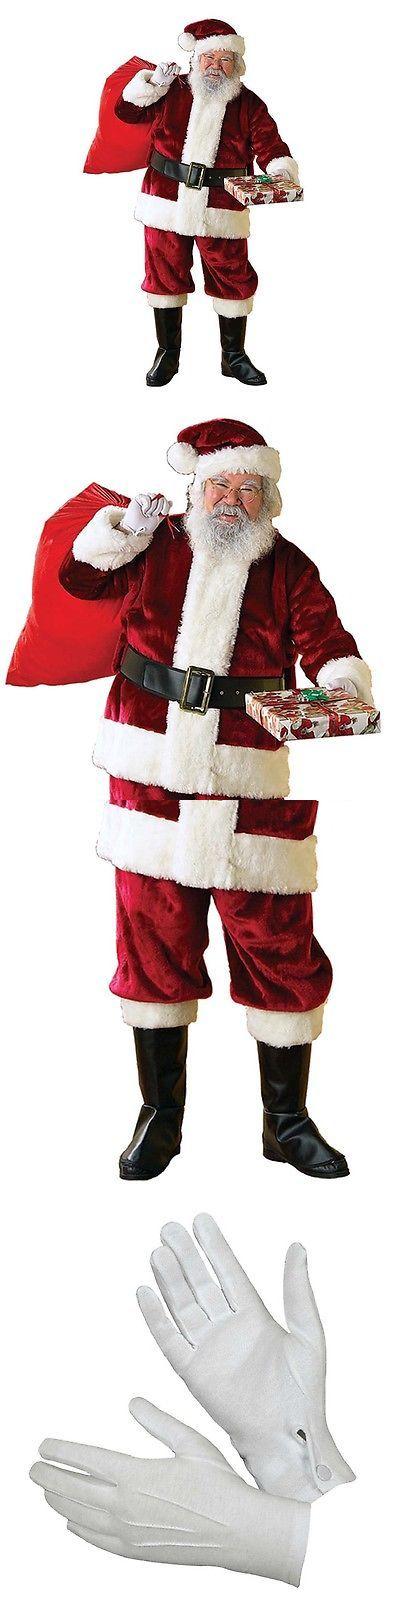 Halloween Costumes Men: Rubie S Regency Plush Christmas Santa Claus Suit Adult Mens Costume, X-Large -> BUY IT NOW ONLY: $54.99 on eBay!